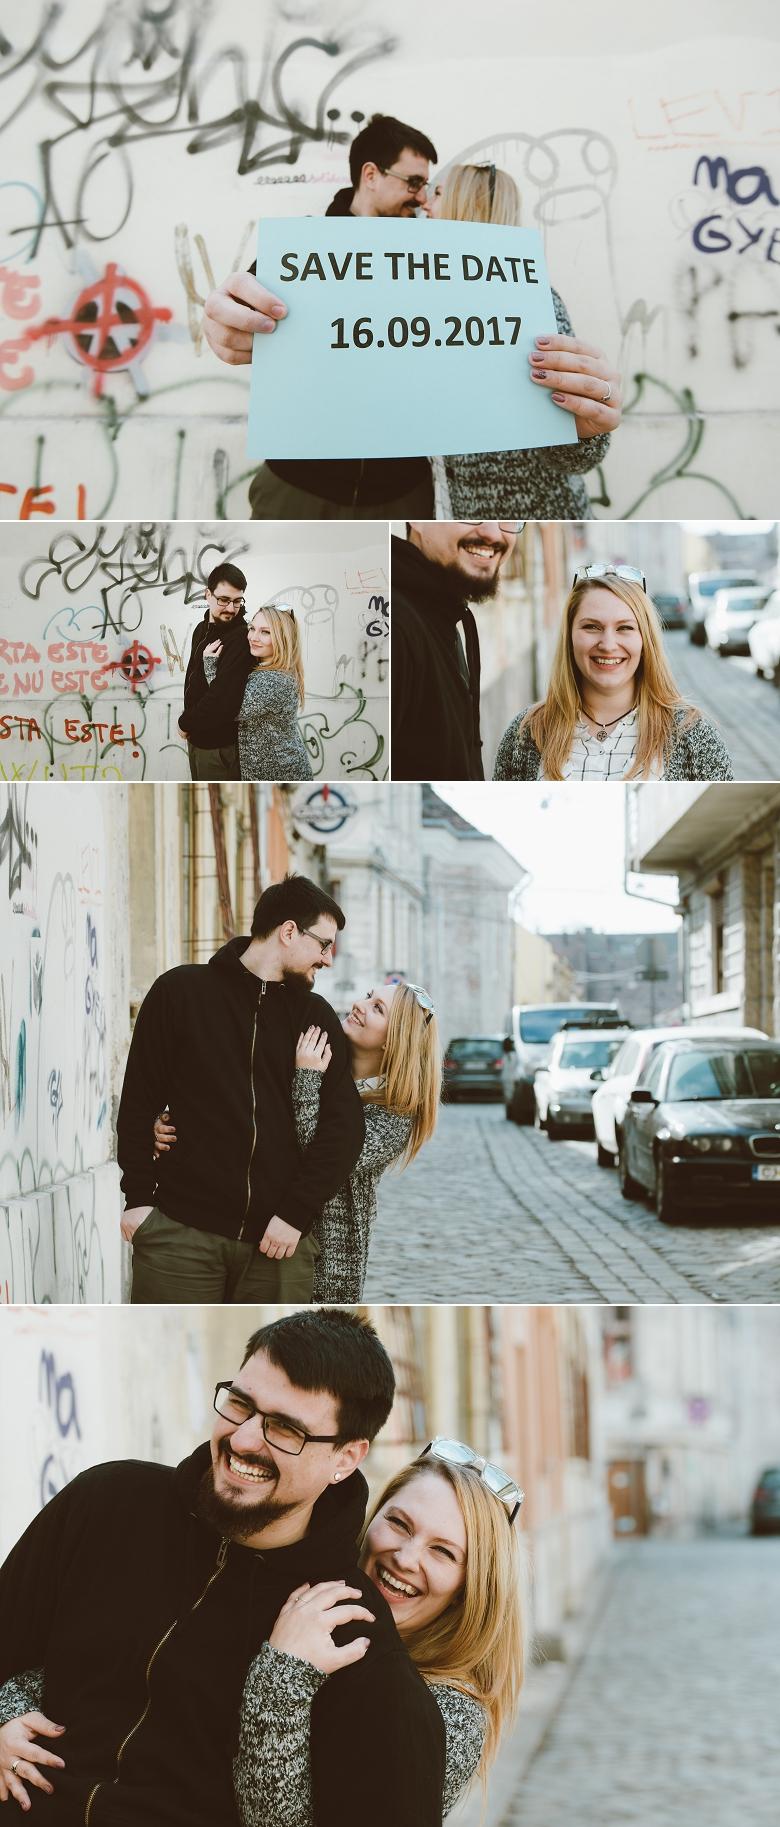 sedinta_foto_save_the_date_cluj_poze_pre_wedding_cluj 10